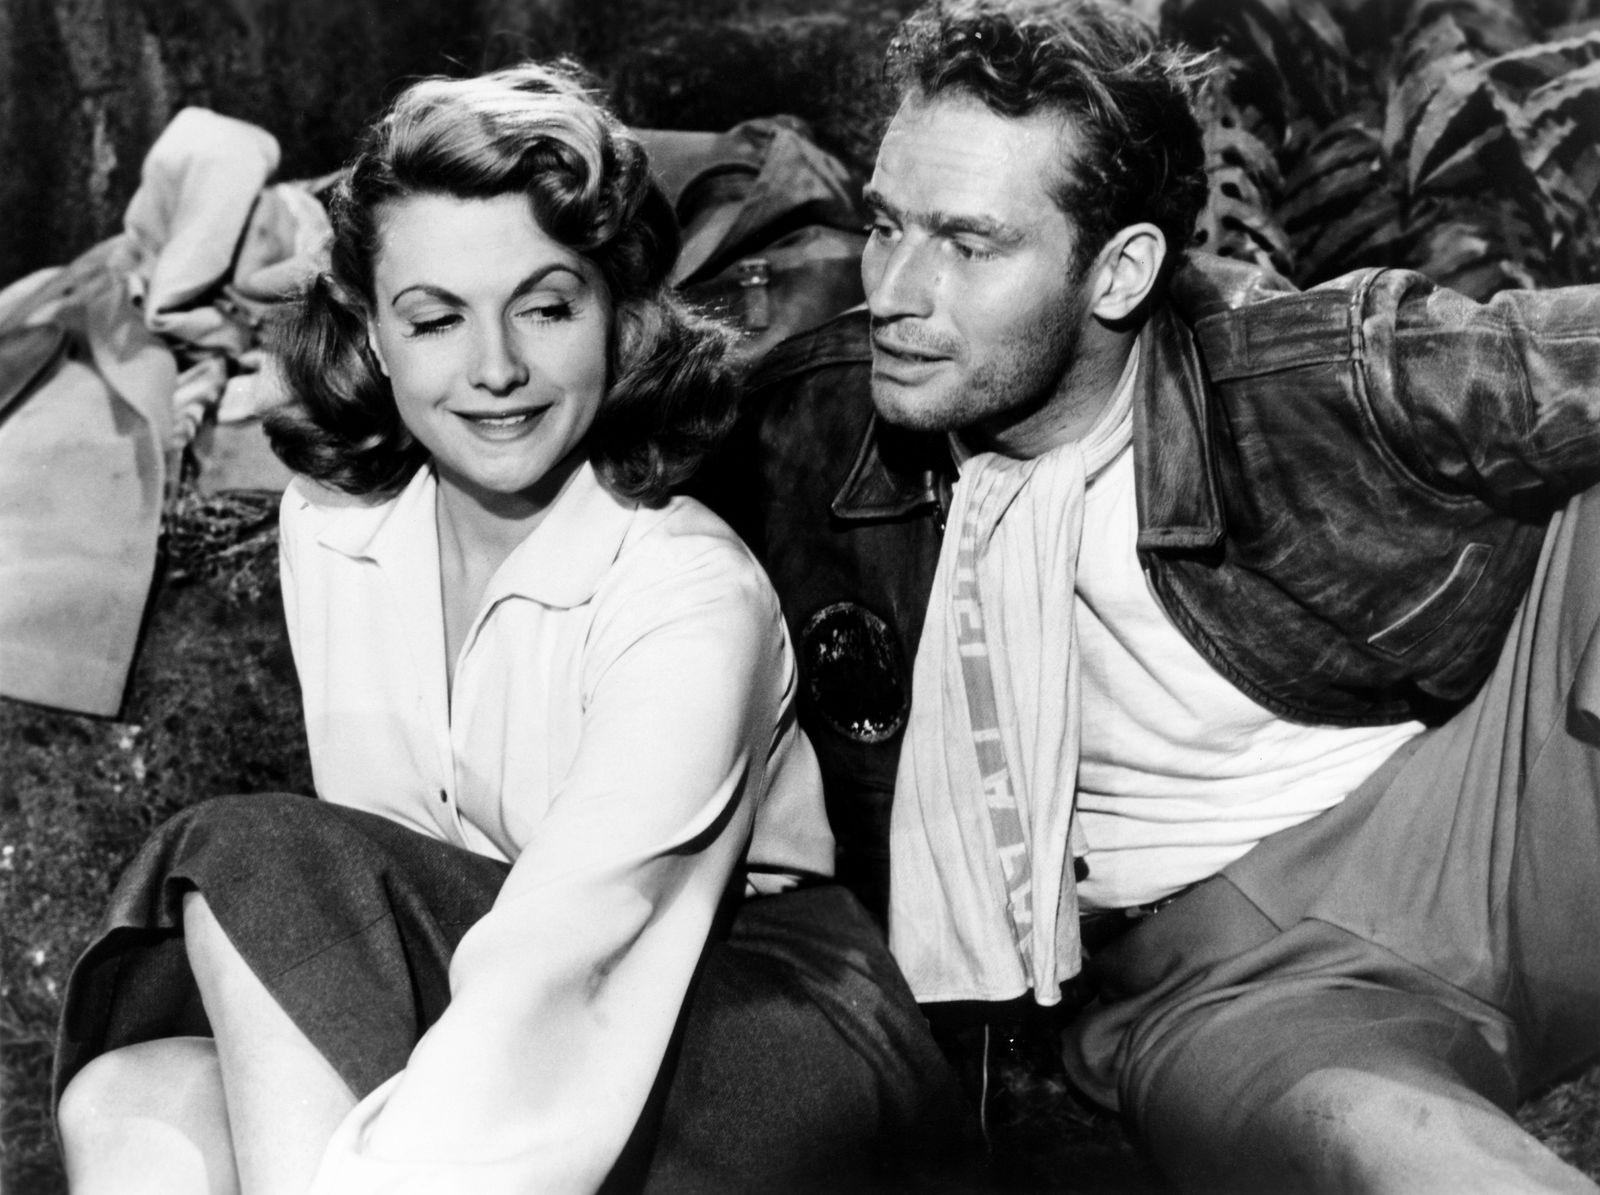 SECRET OF THE INCAS, from left, Nicole Maurey, Charlton Heston, 1954